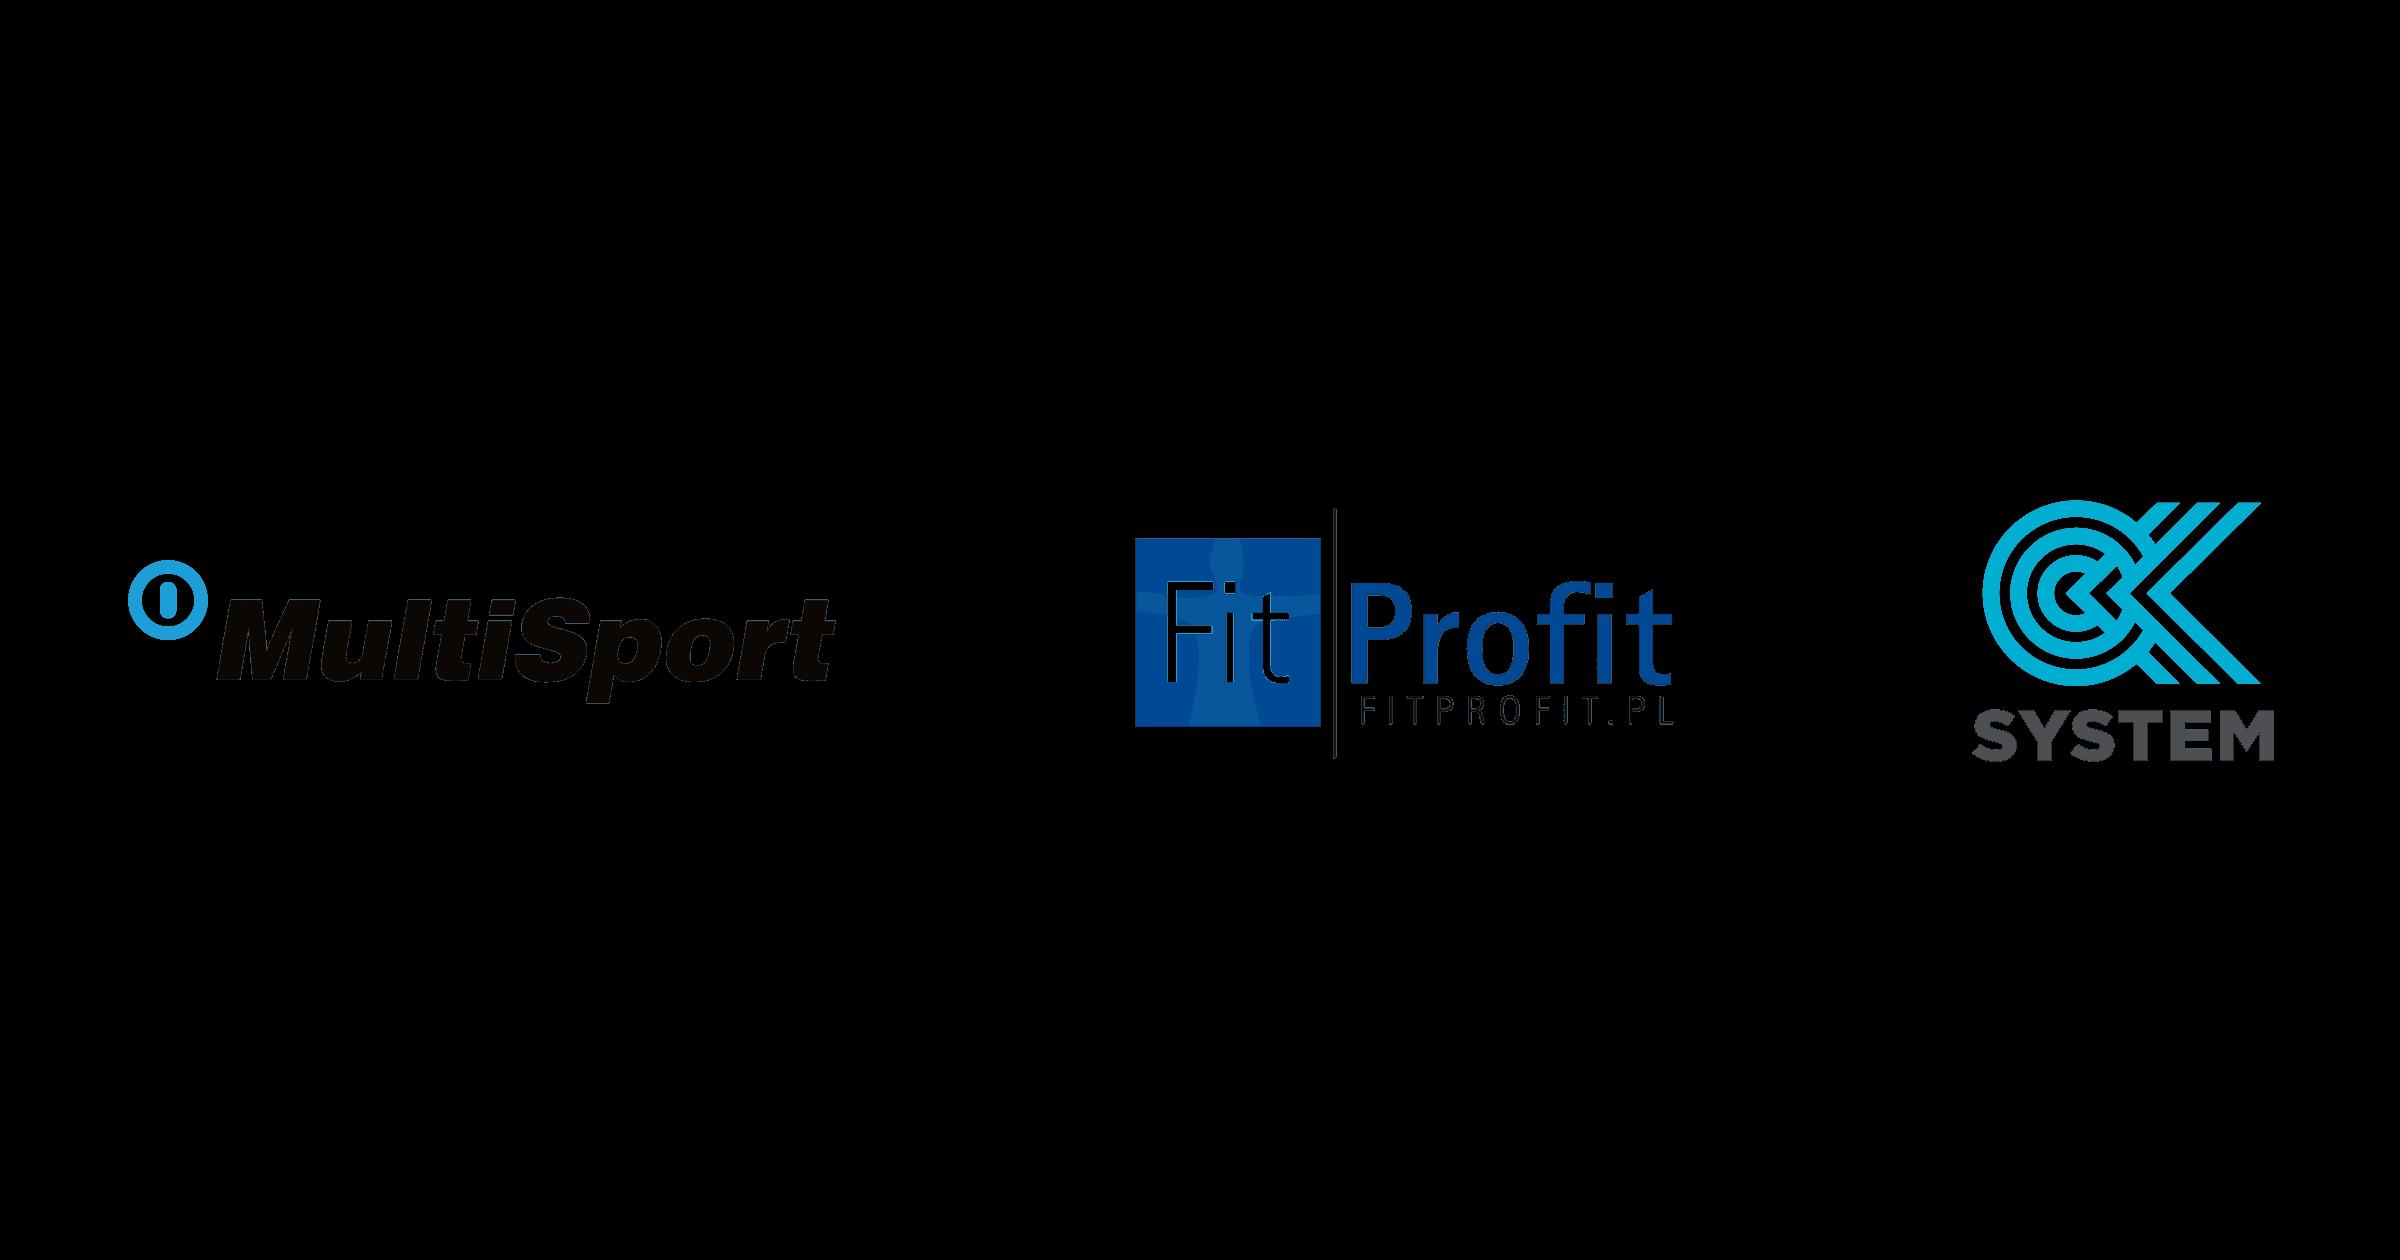 Multisport Fitprofit Ok System